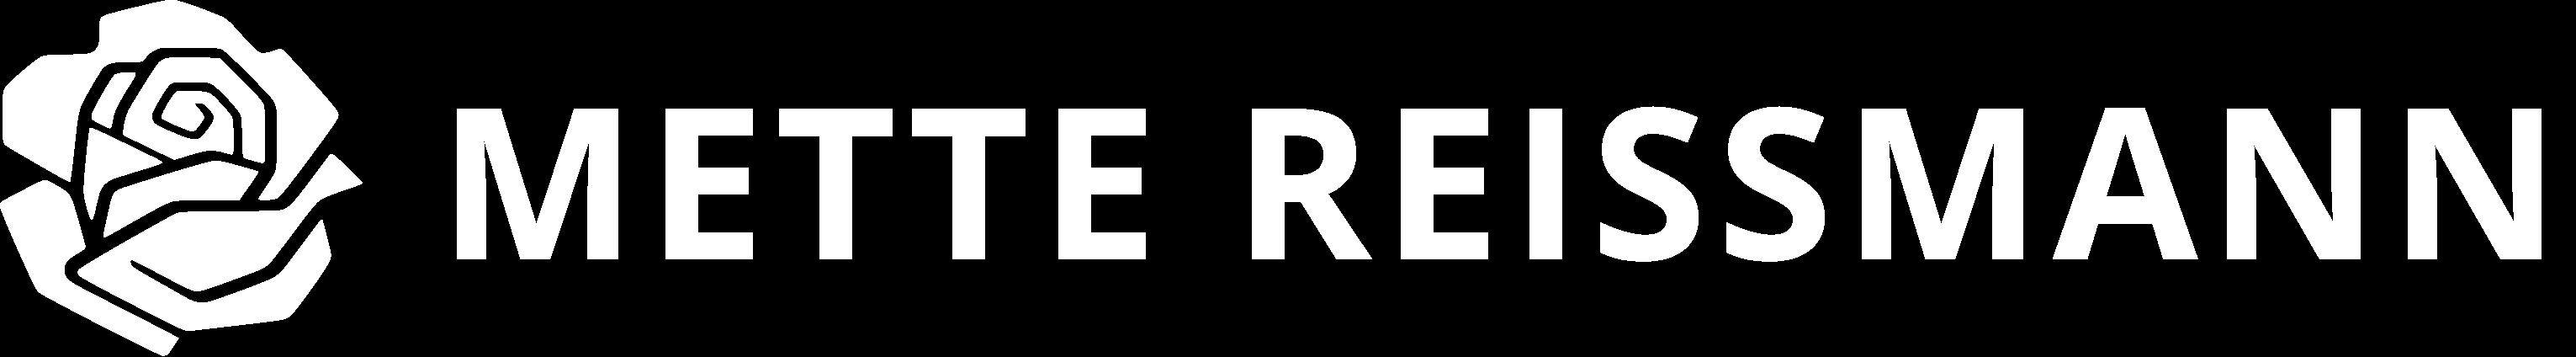 Mette Reissmann logo